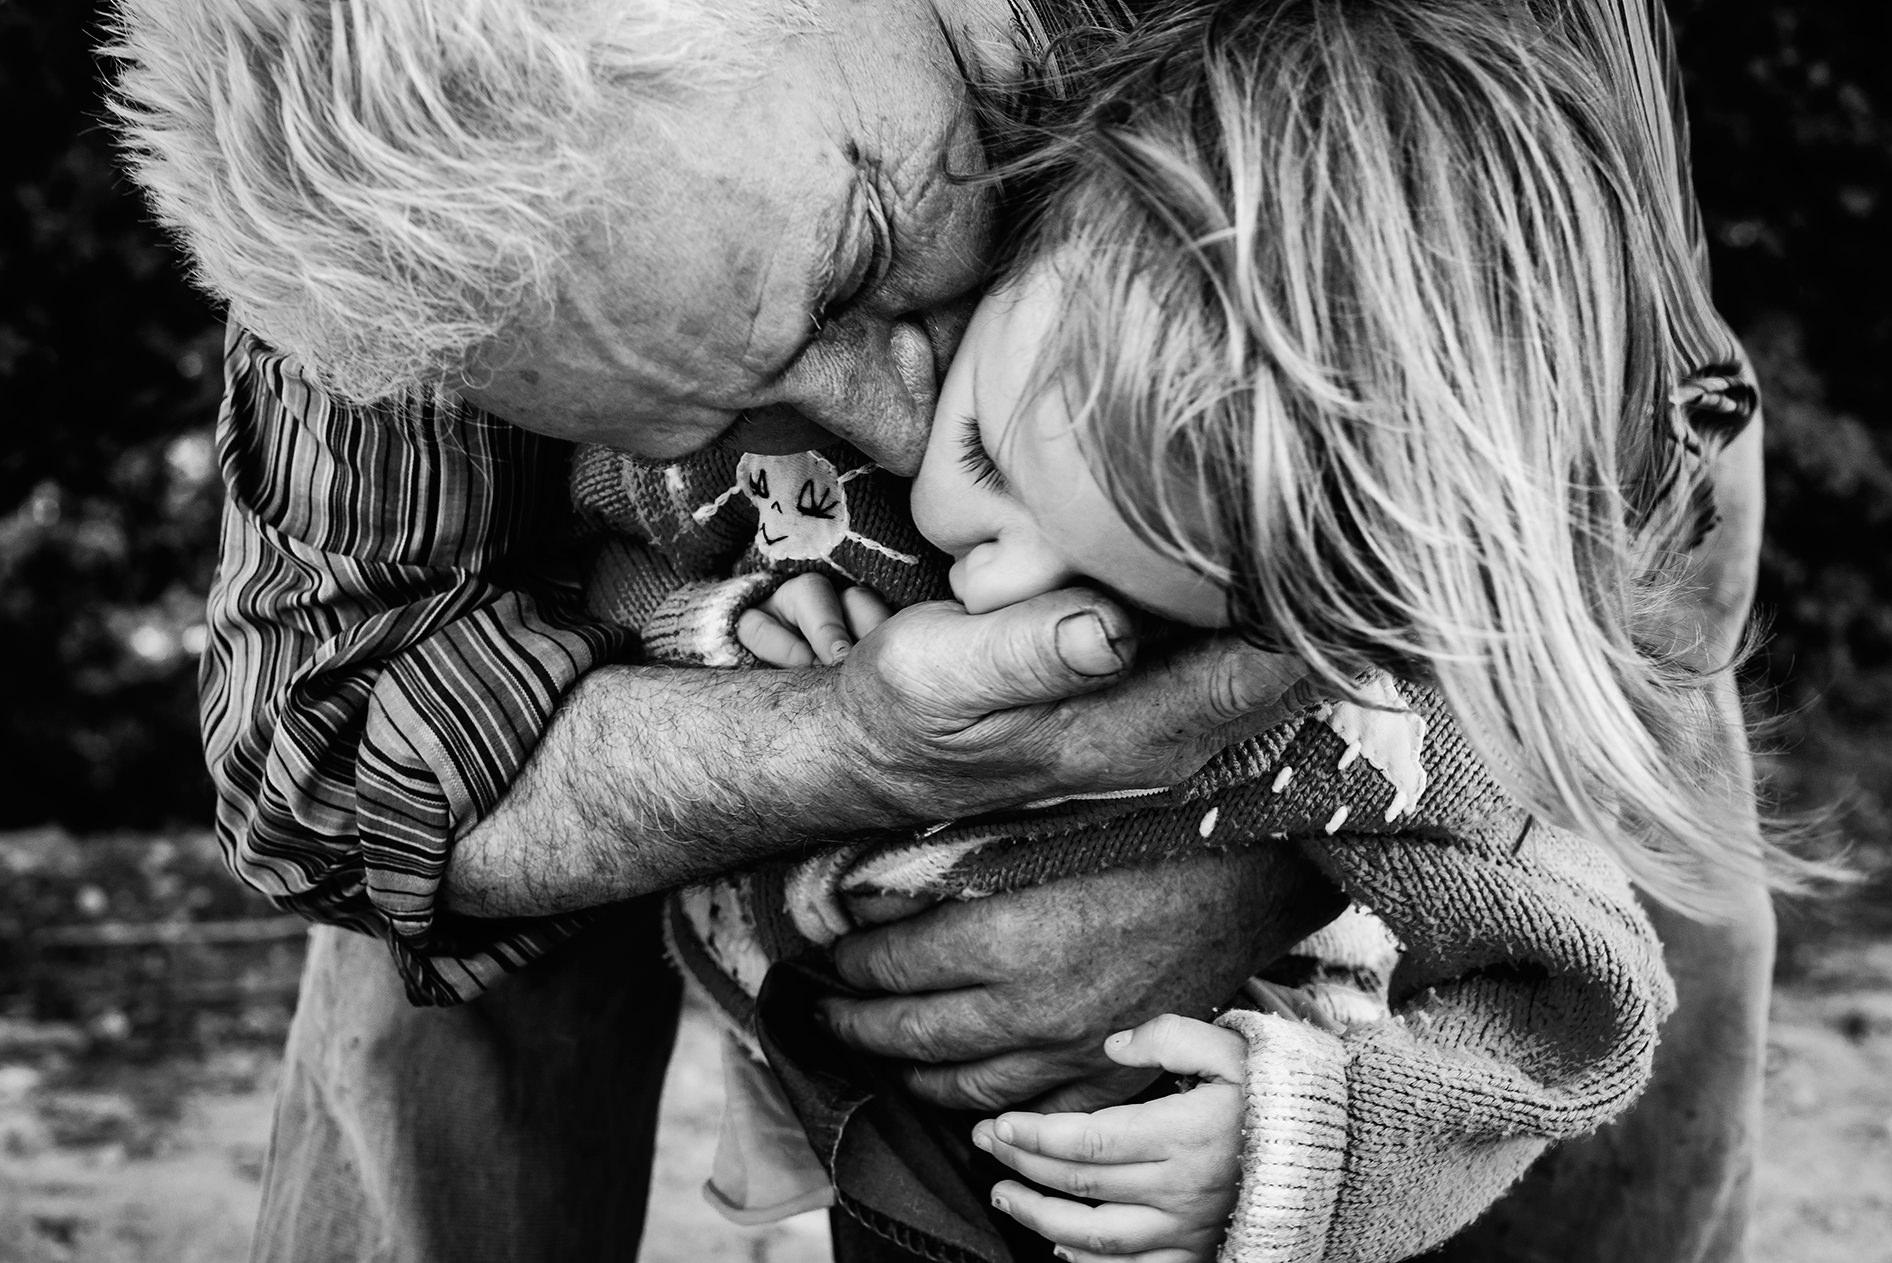 fotografia natural de familia, documental sin posados